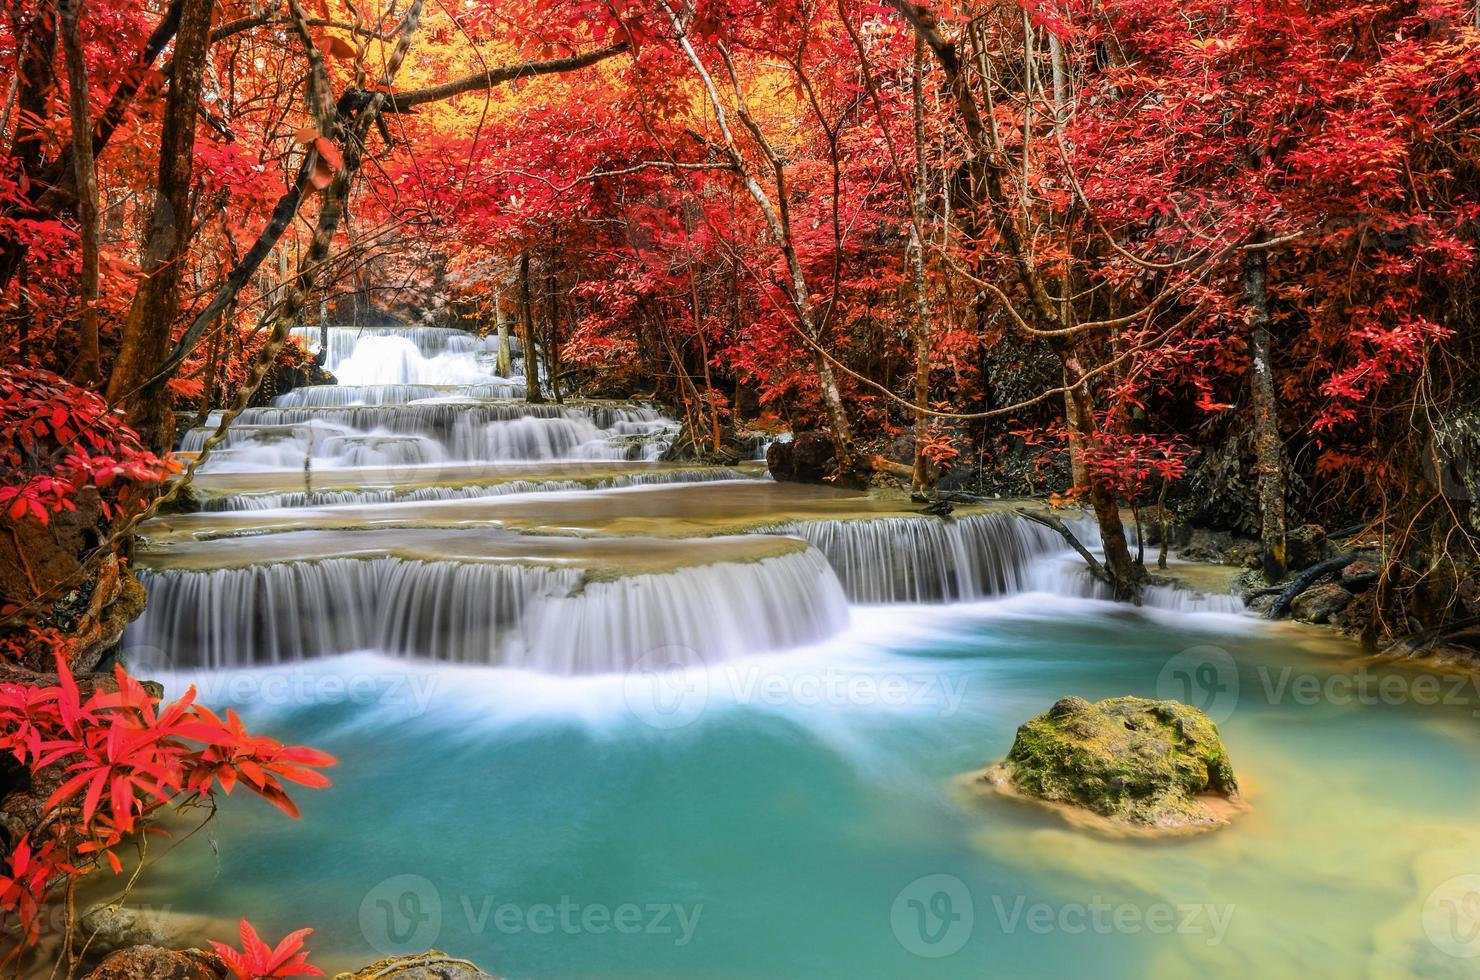 bella cascata nella foresta profonda, huay mae khamin, kanchanaburi, foto